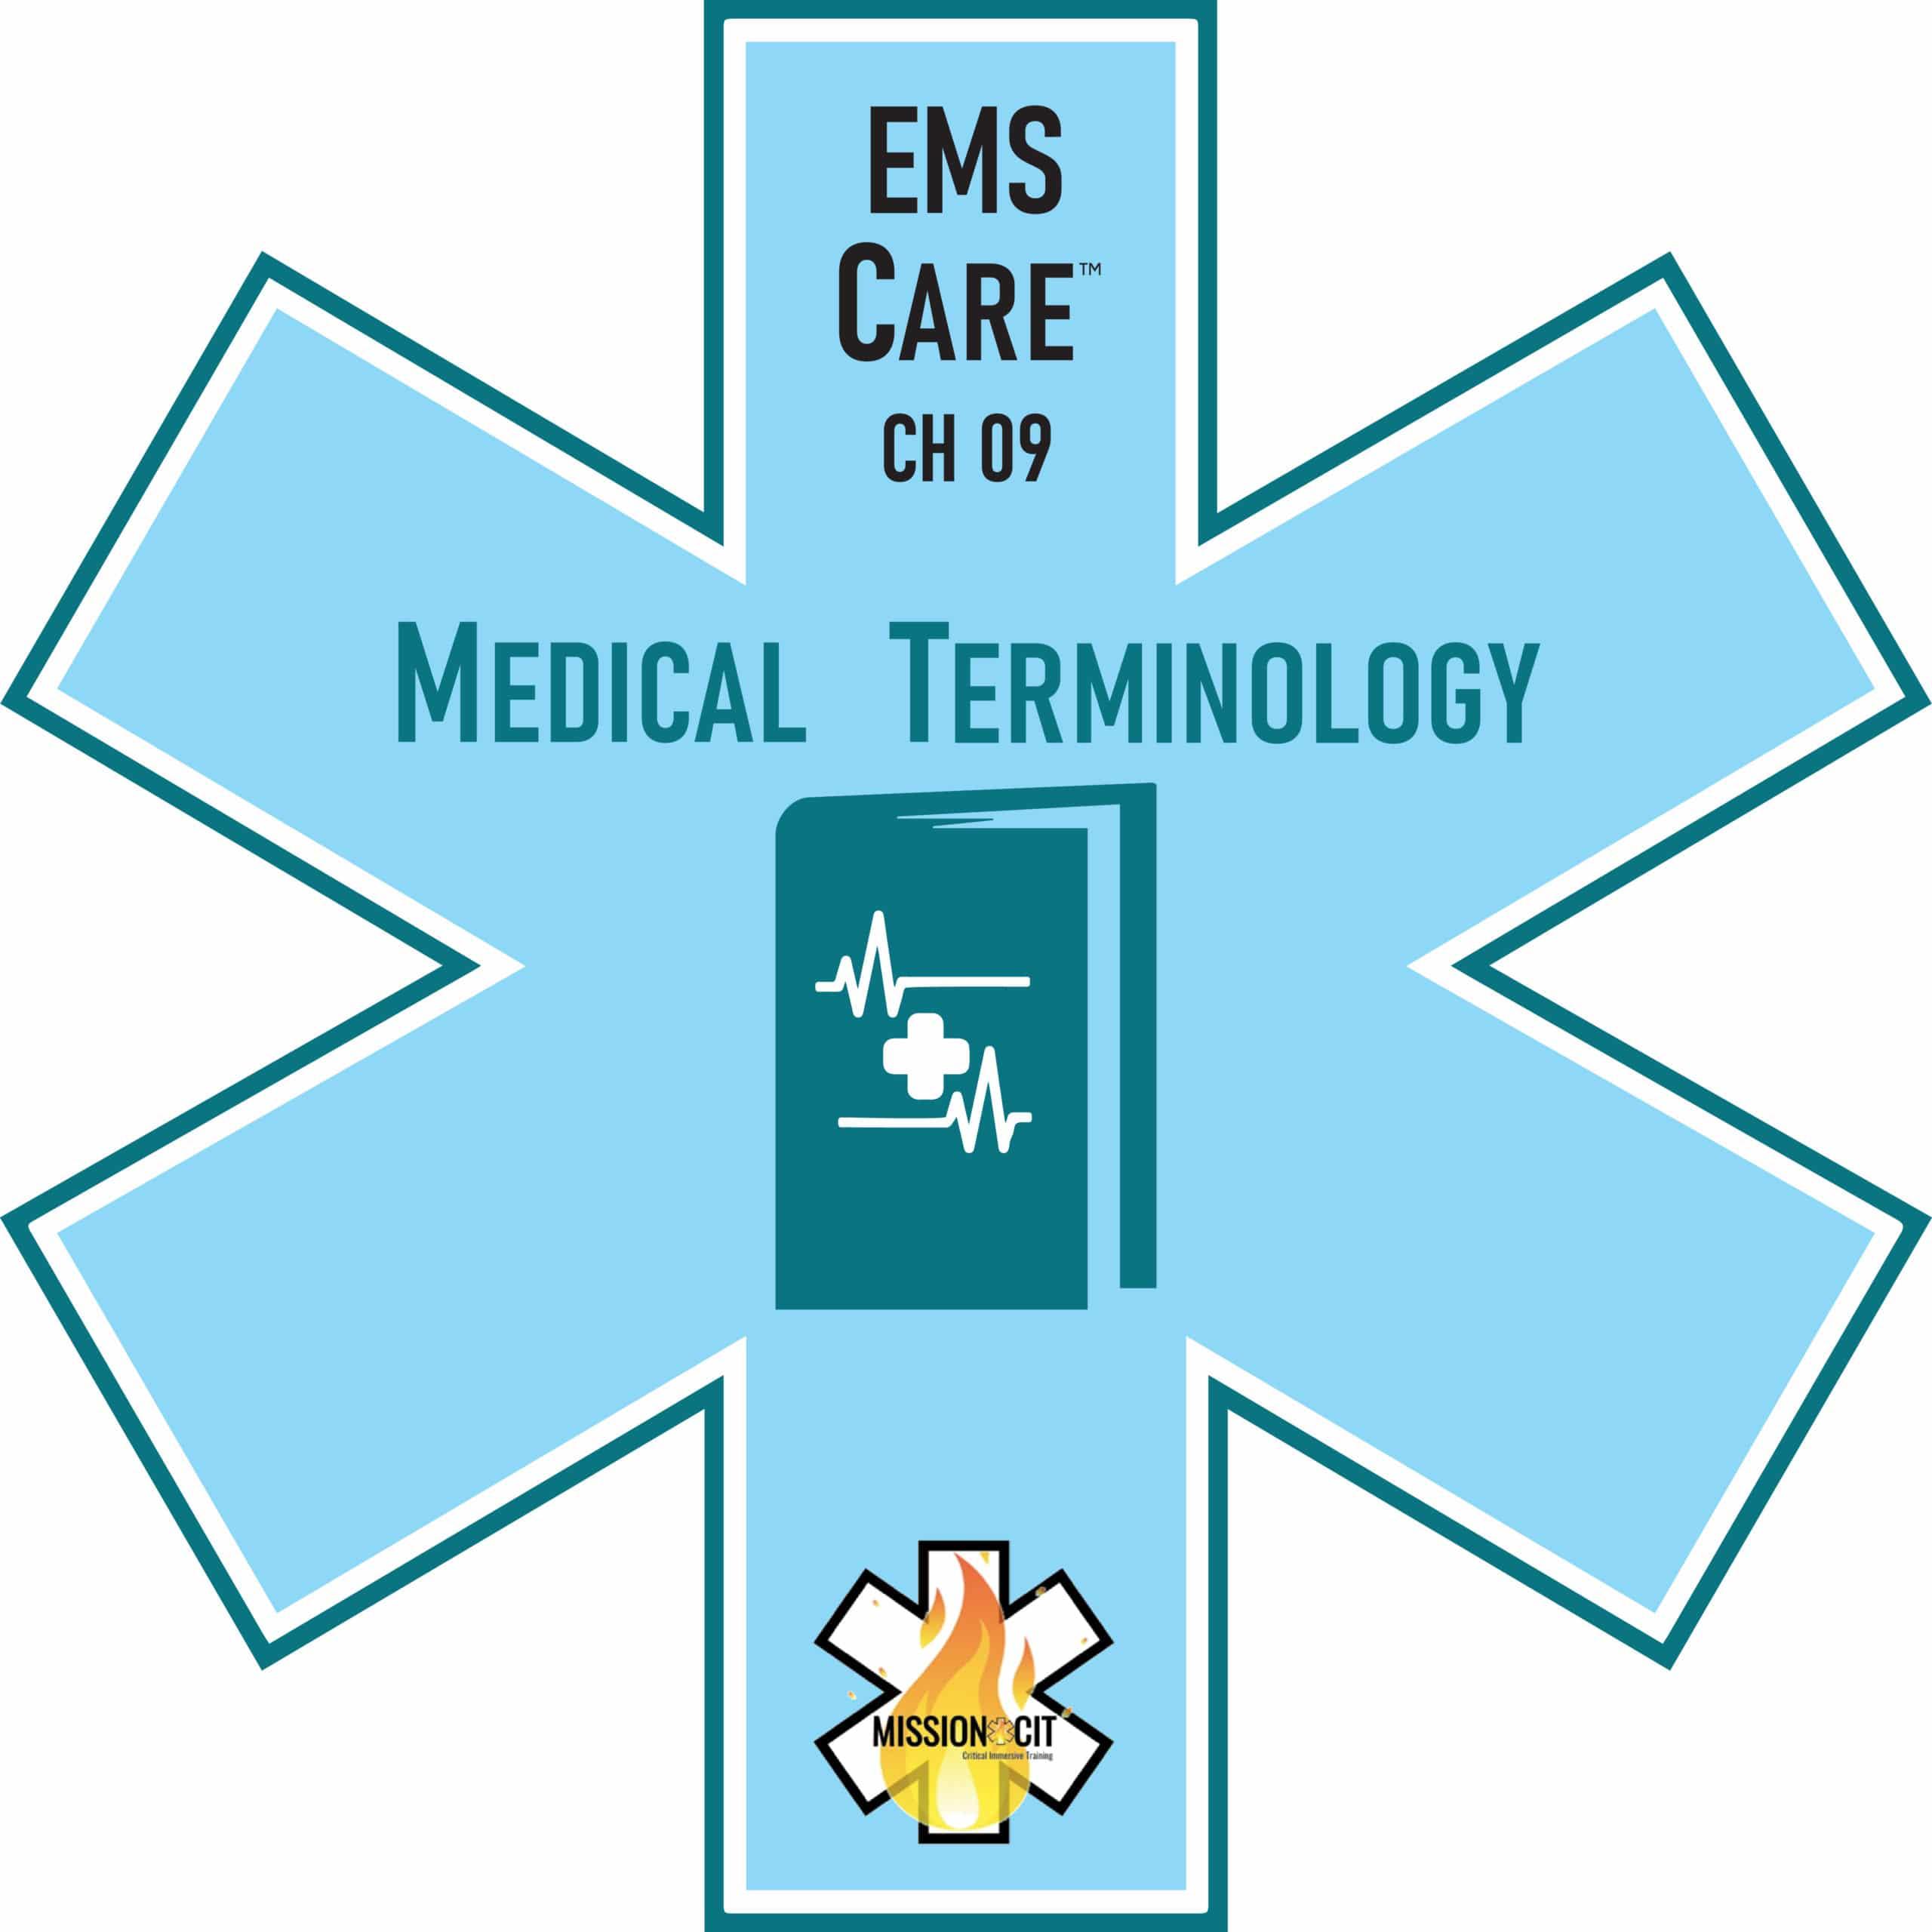 missioncit-ems-care-medical-terminology